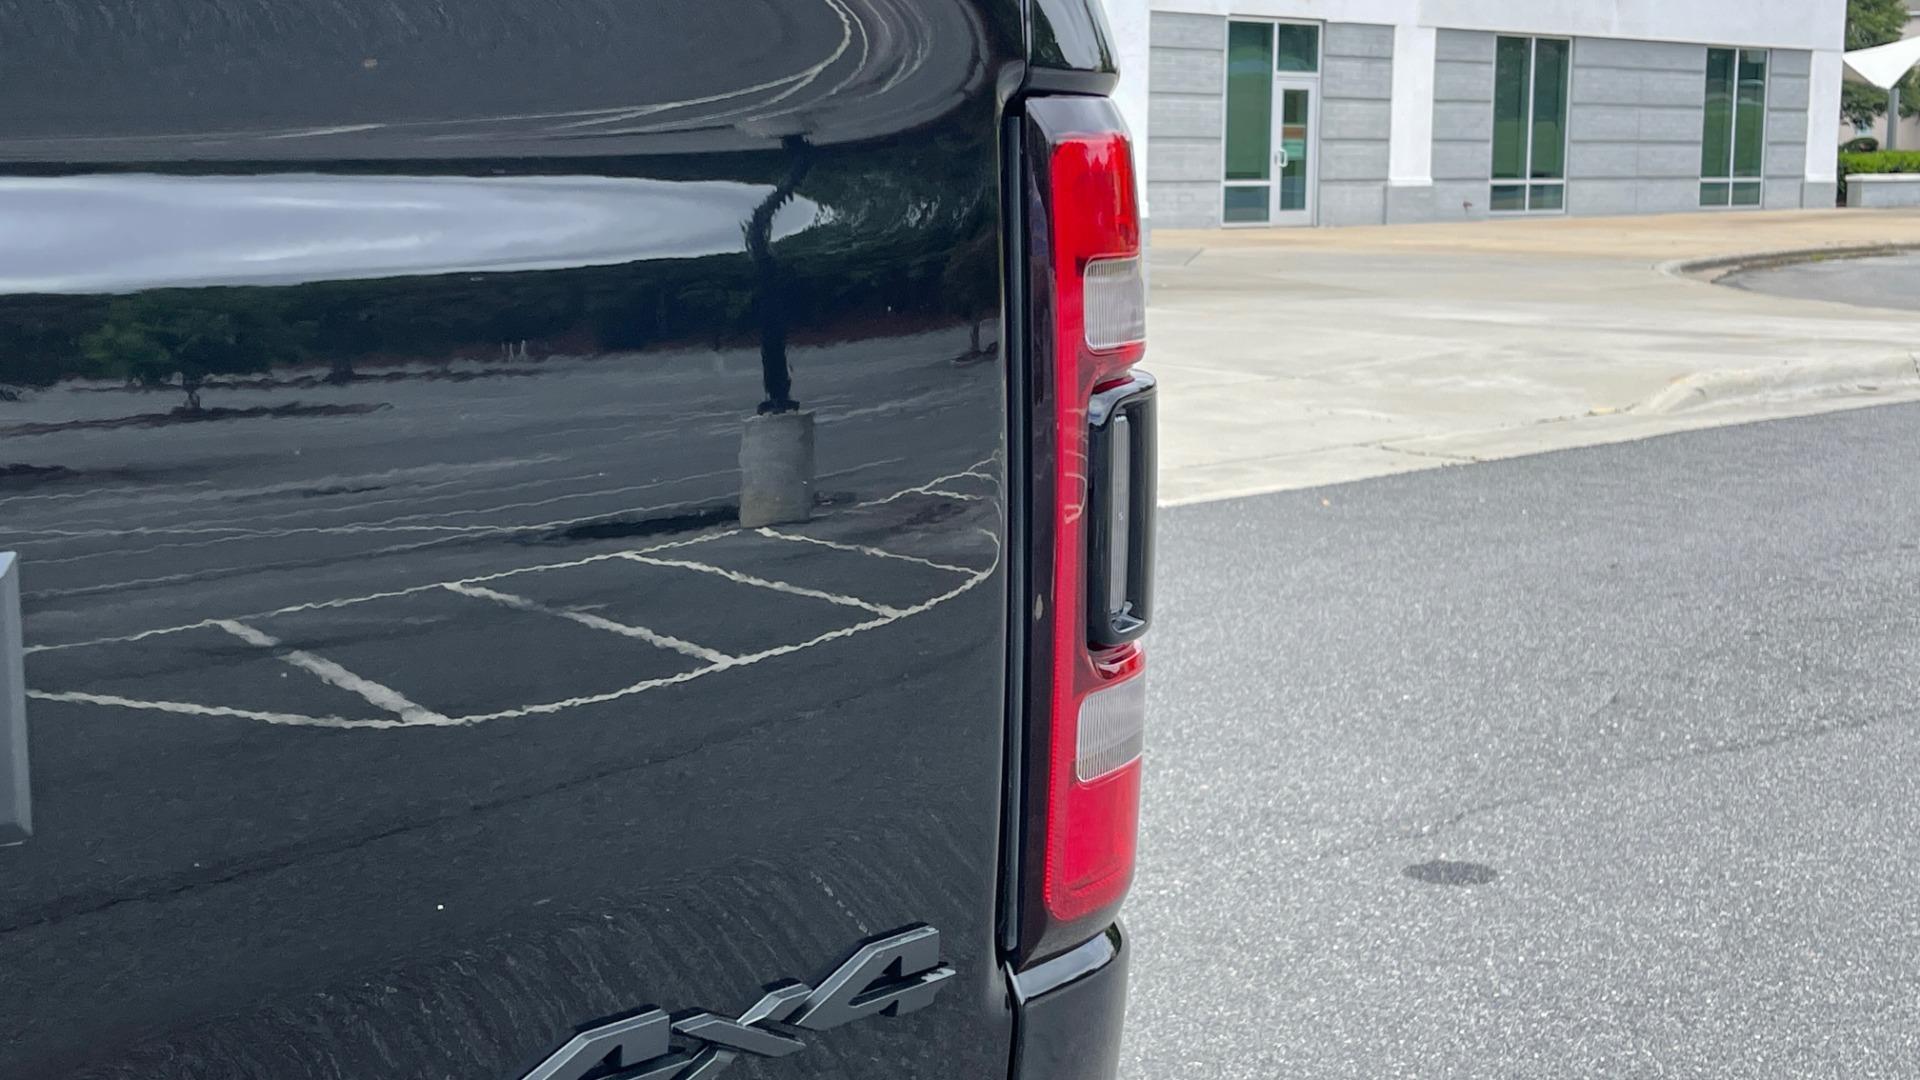 Used 2019 Ram 1500 REBEL QUADCAB 4X4 / 5.7L HEMI / 8-SPD AUTO / REMOTE START / PARK ASSIST for sale $44,495 at Formula Imports in Charlotte NC 28227 21